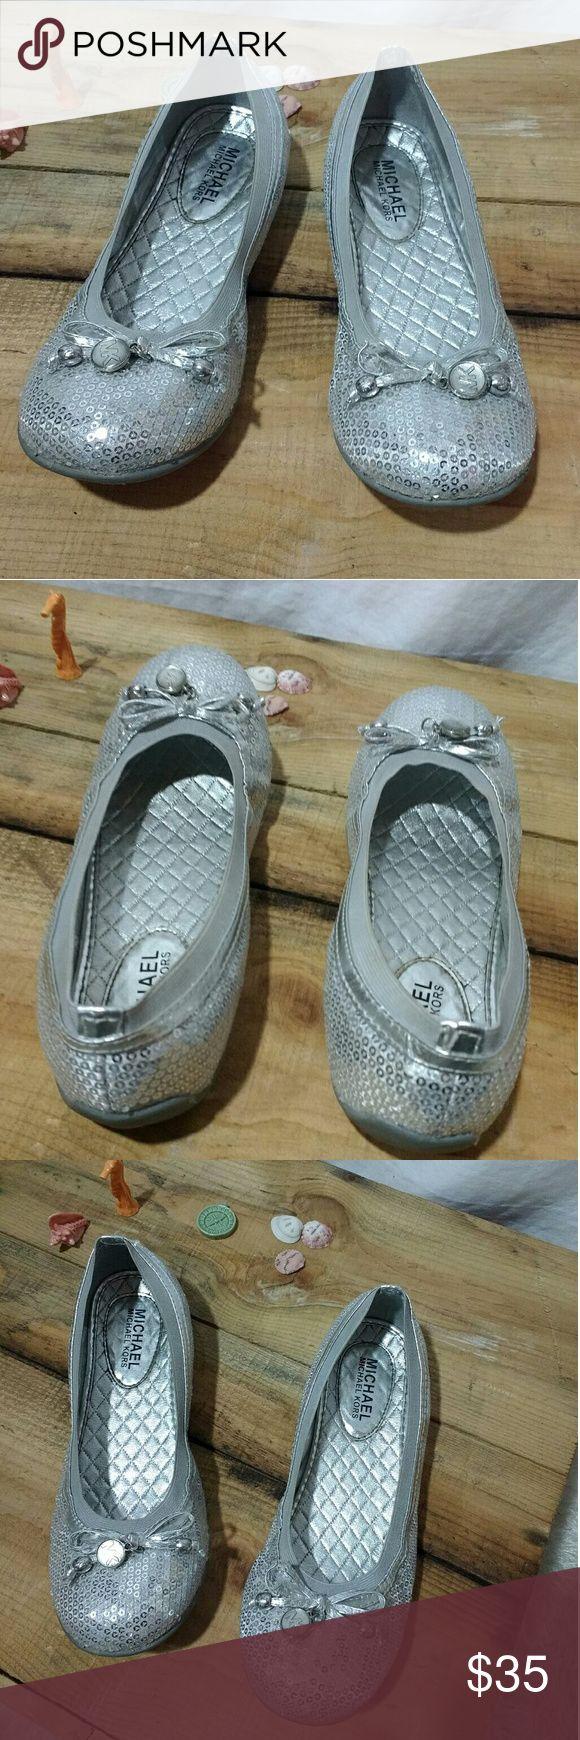 Cute!!! Michael Kors Flats! Silver Sequined Flats! Gorgeous Michael Kors Sequined Flats! Nice! Michael Kors Shoes Flats & Loafers